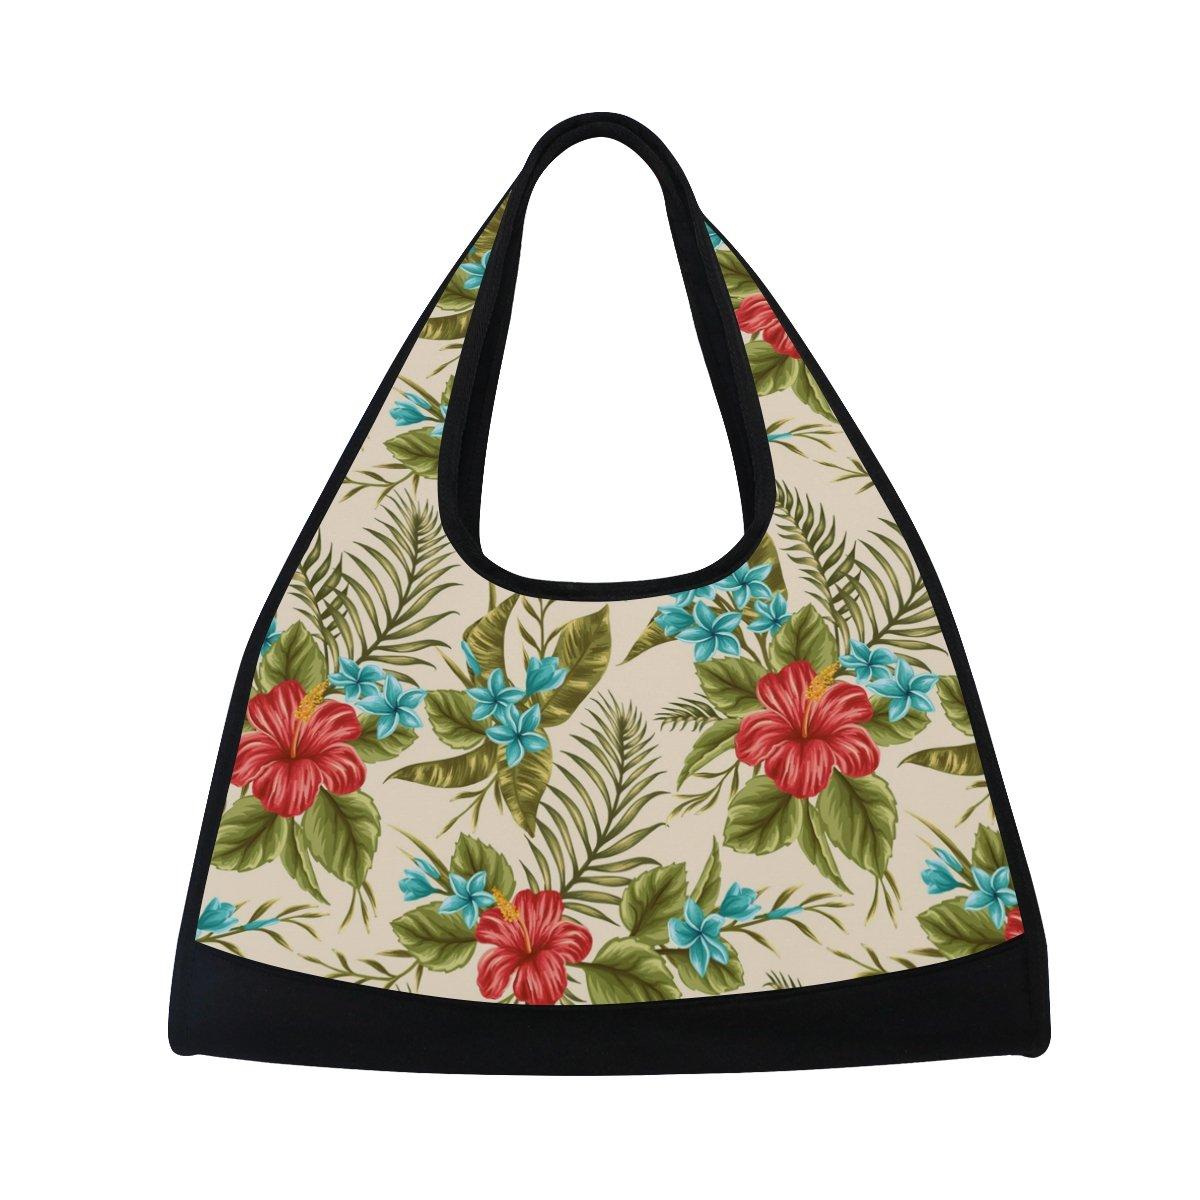 AHOMY Canvas Sports Gym Bag Flowers Tropical Plants Leaf Travel Shoulder Bag